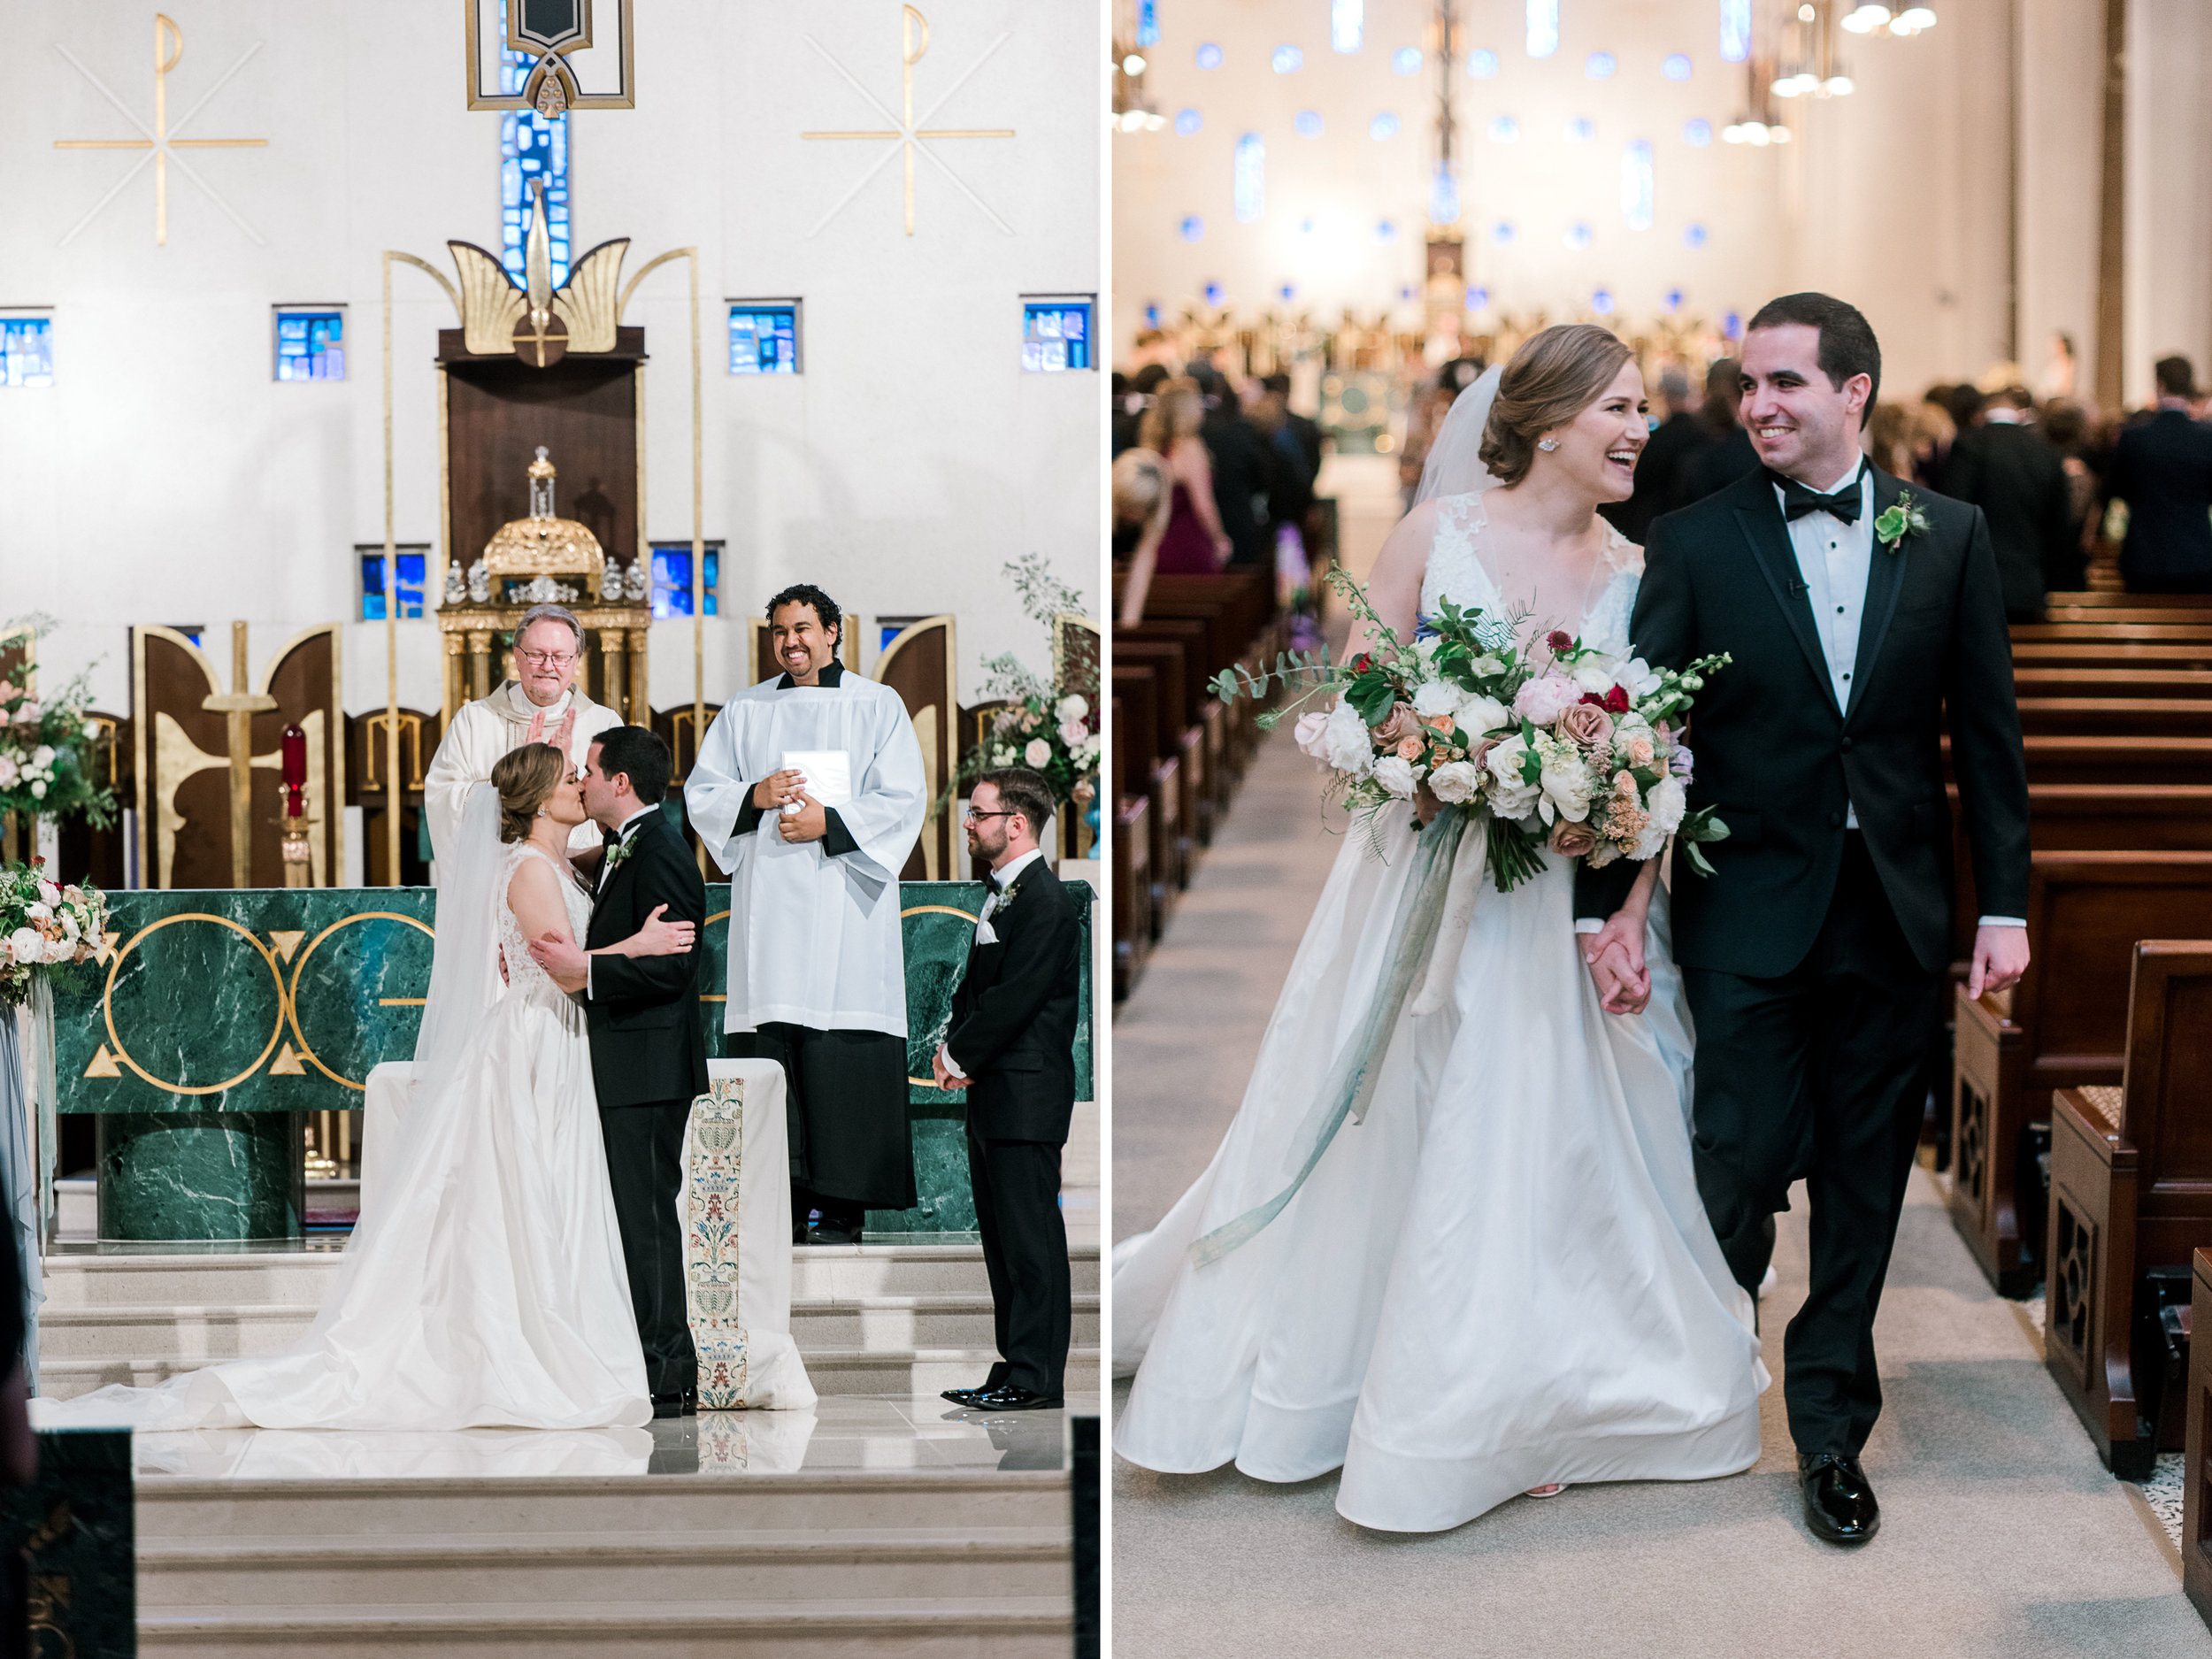 St-Michaels-Catholic-Church-Houston-Wedding-Ceremony-Josh-Dana-Fernandez-Photographer-Destination-Austin-Dallas-Fine-Art-Film-107.jpg